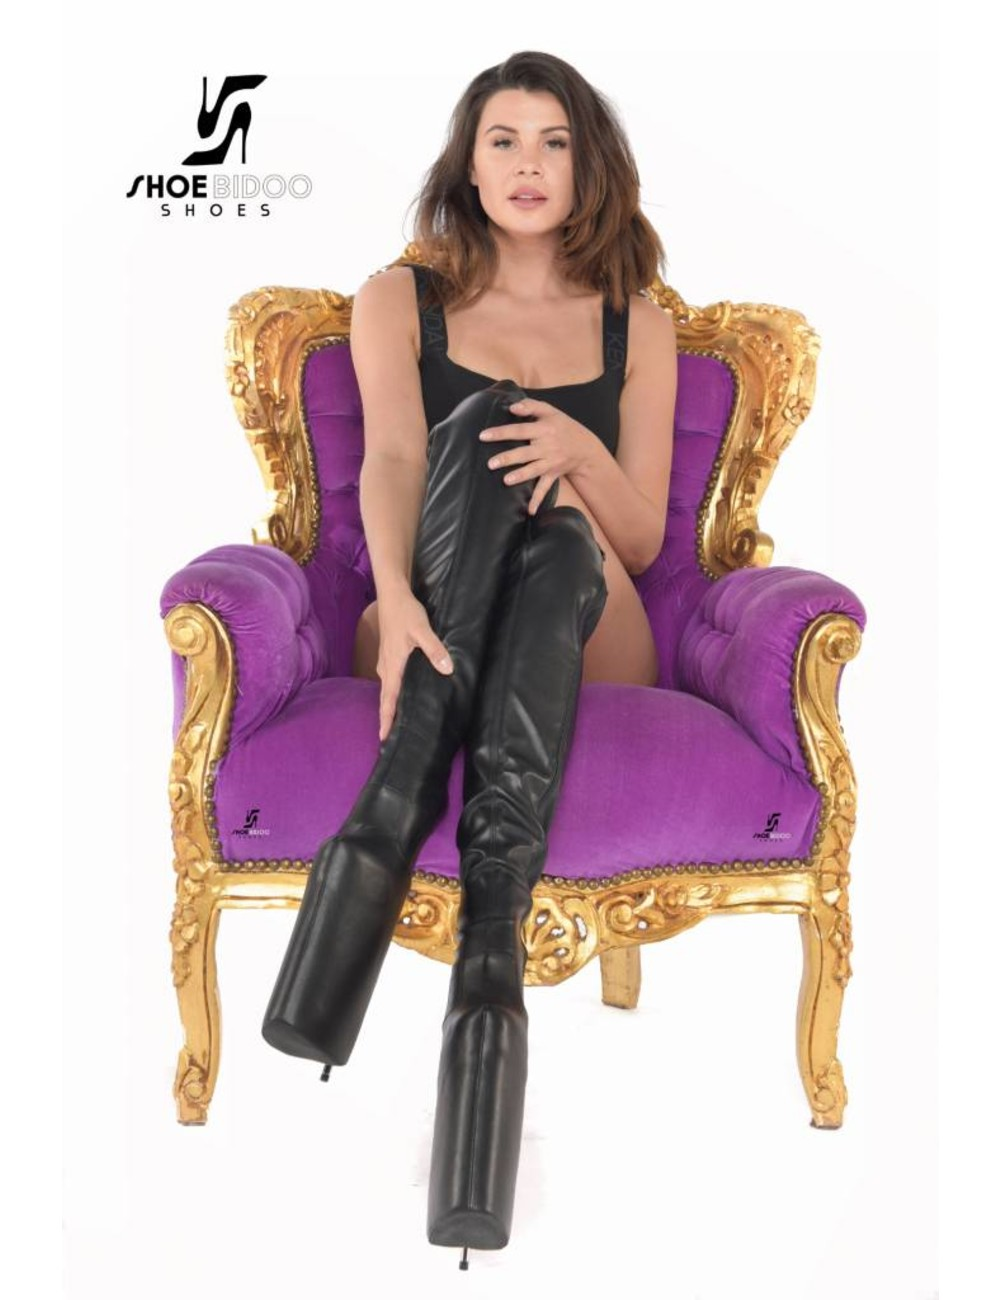 Giaro Olga wears extreme high heels